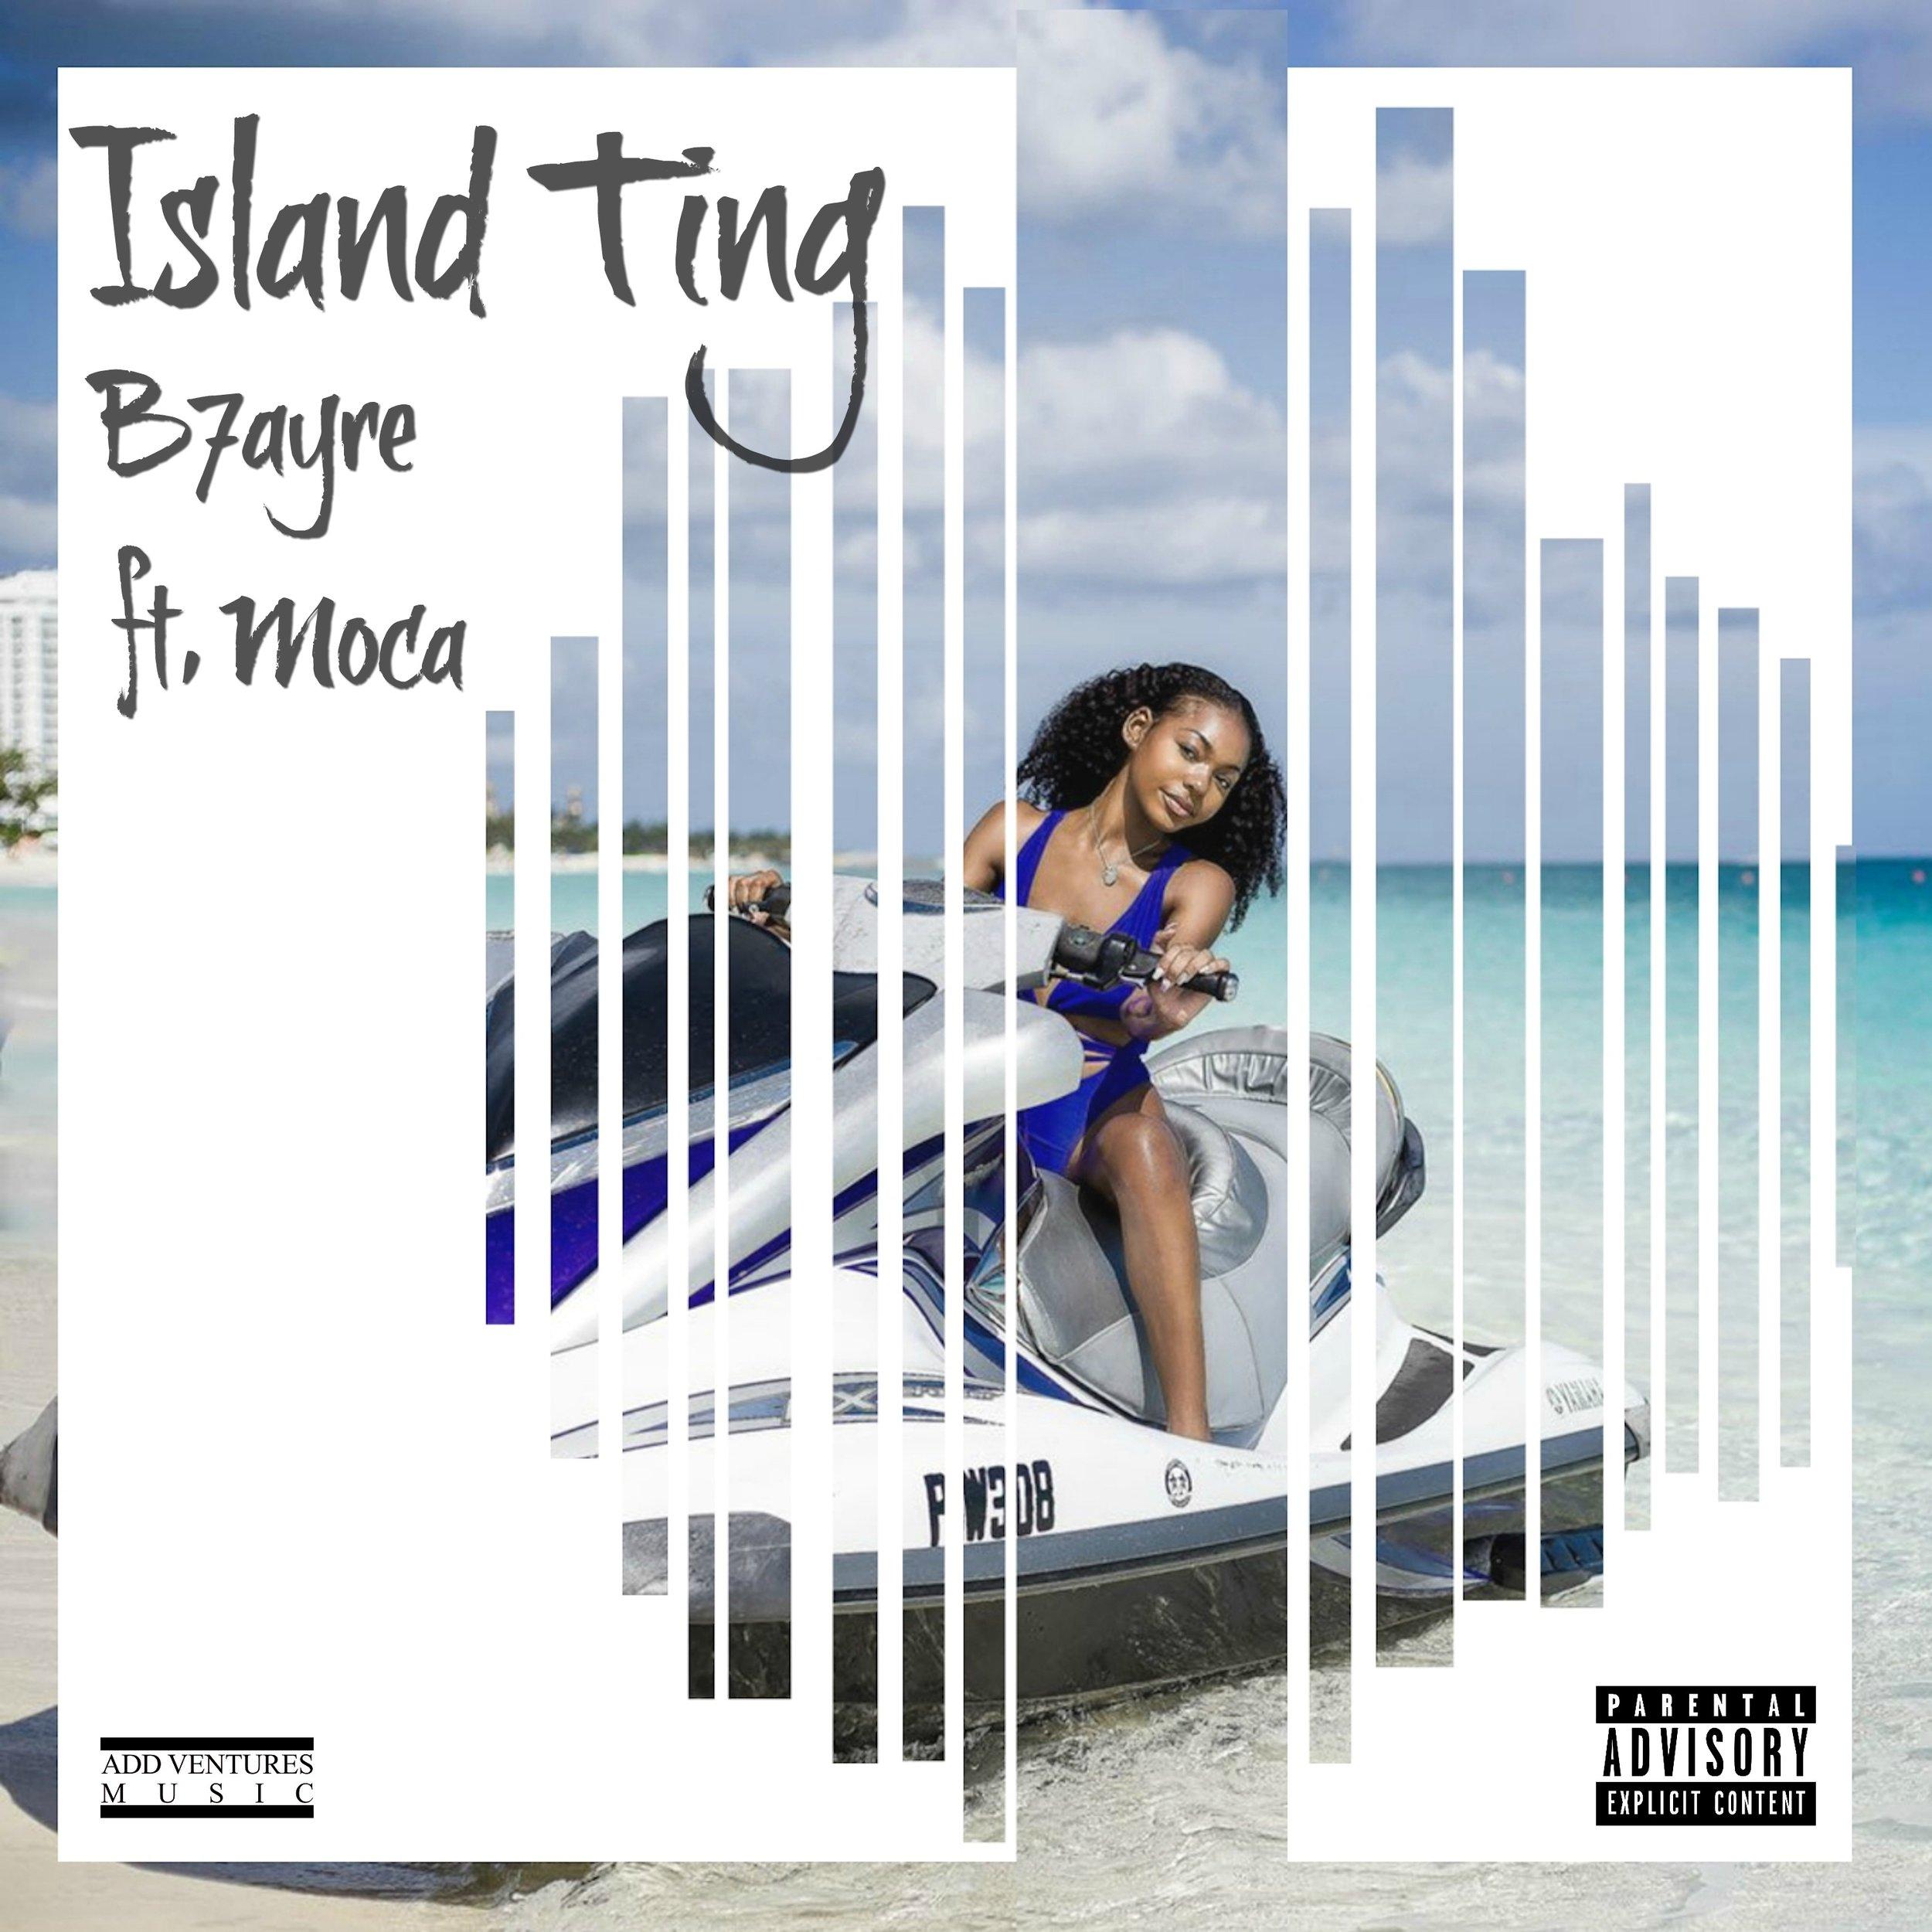 B7ayre - Island Ting Cover Art (Explicit).jpg